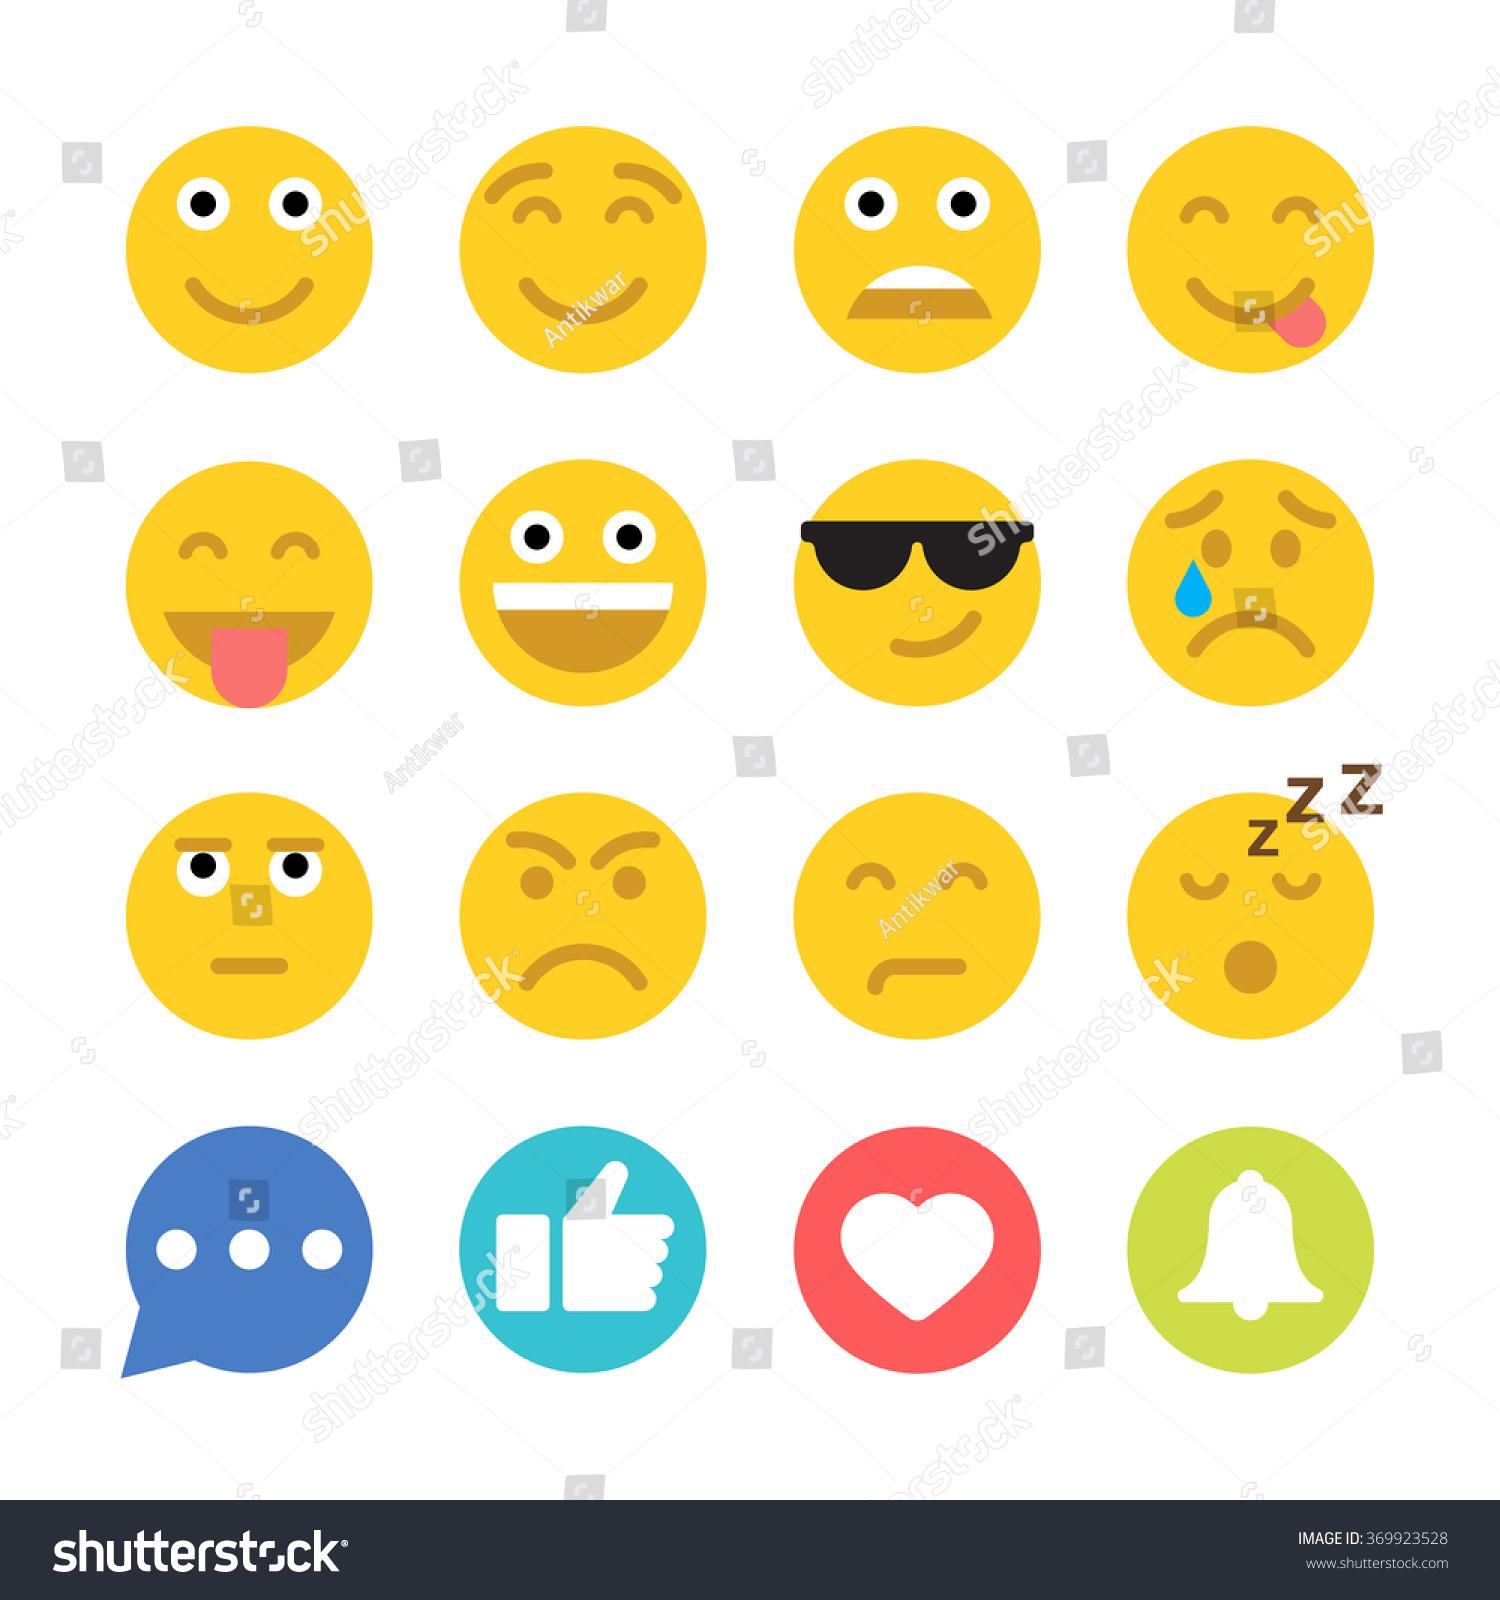 No-Sweat Social Media Tips For Budding Entrepreneurs |